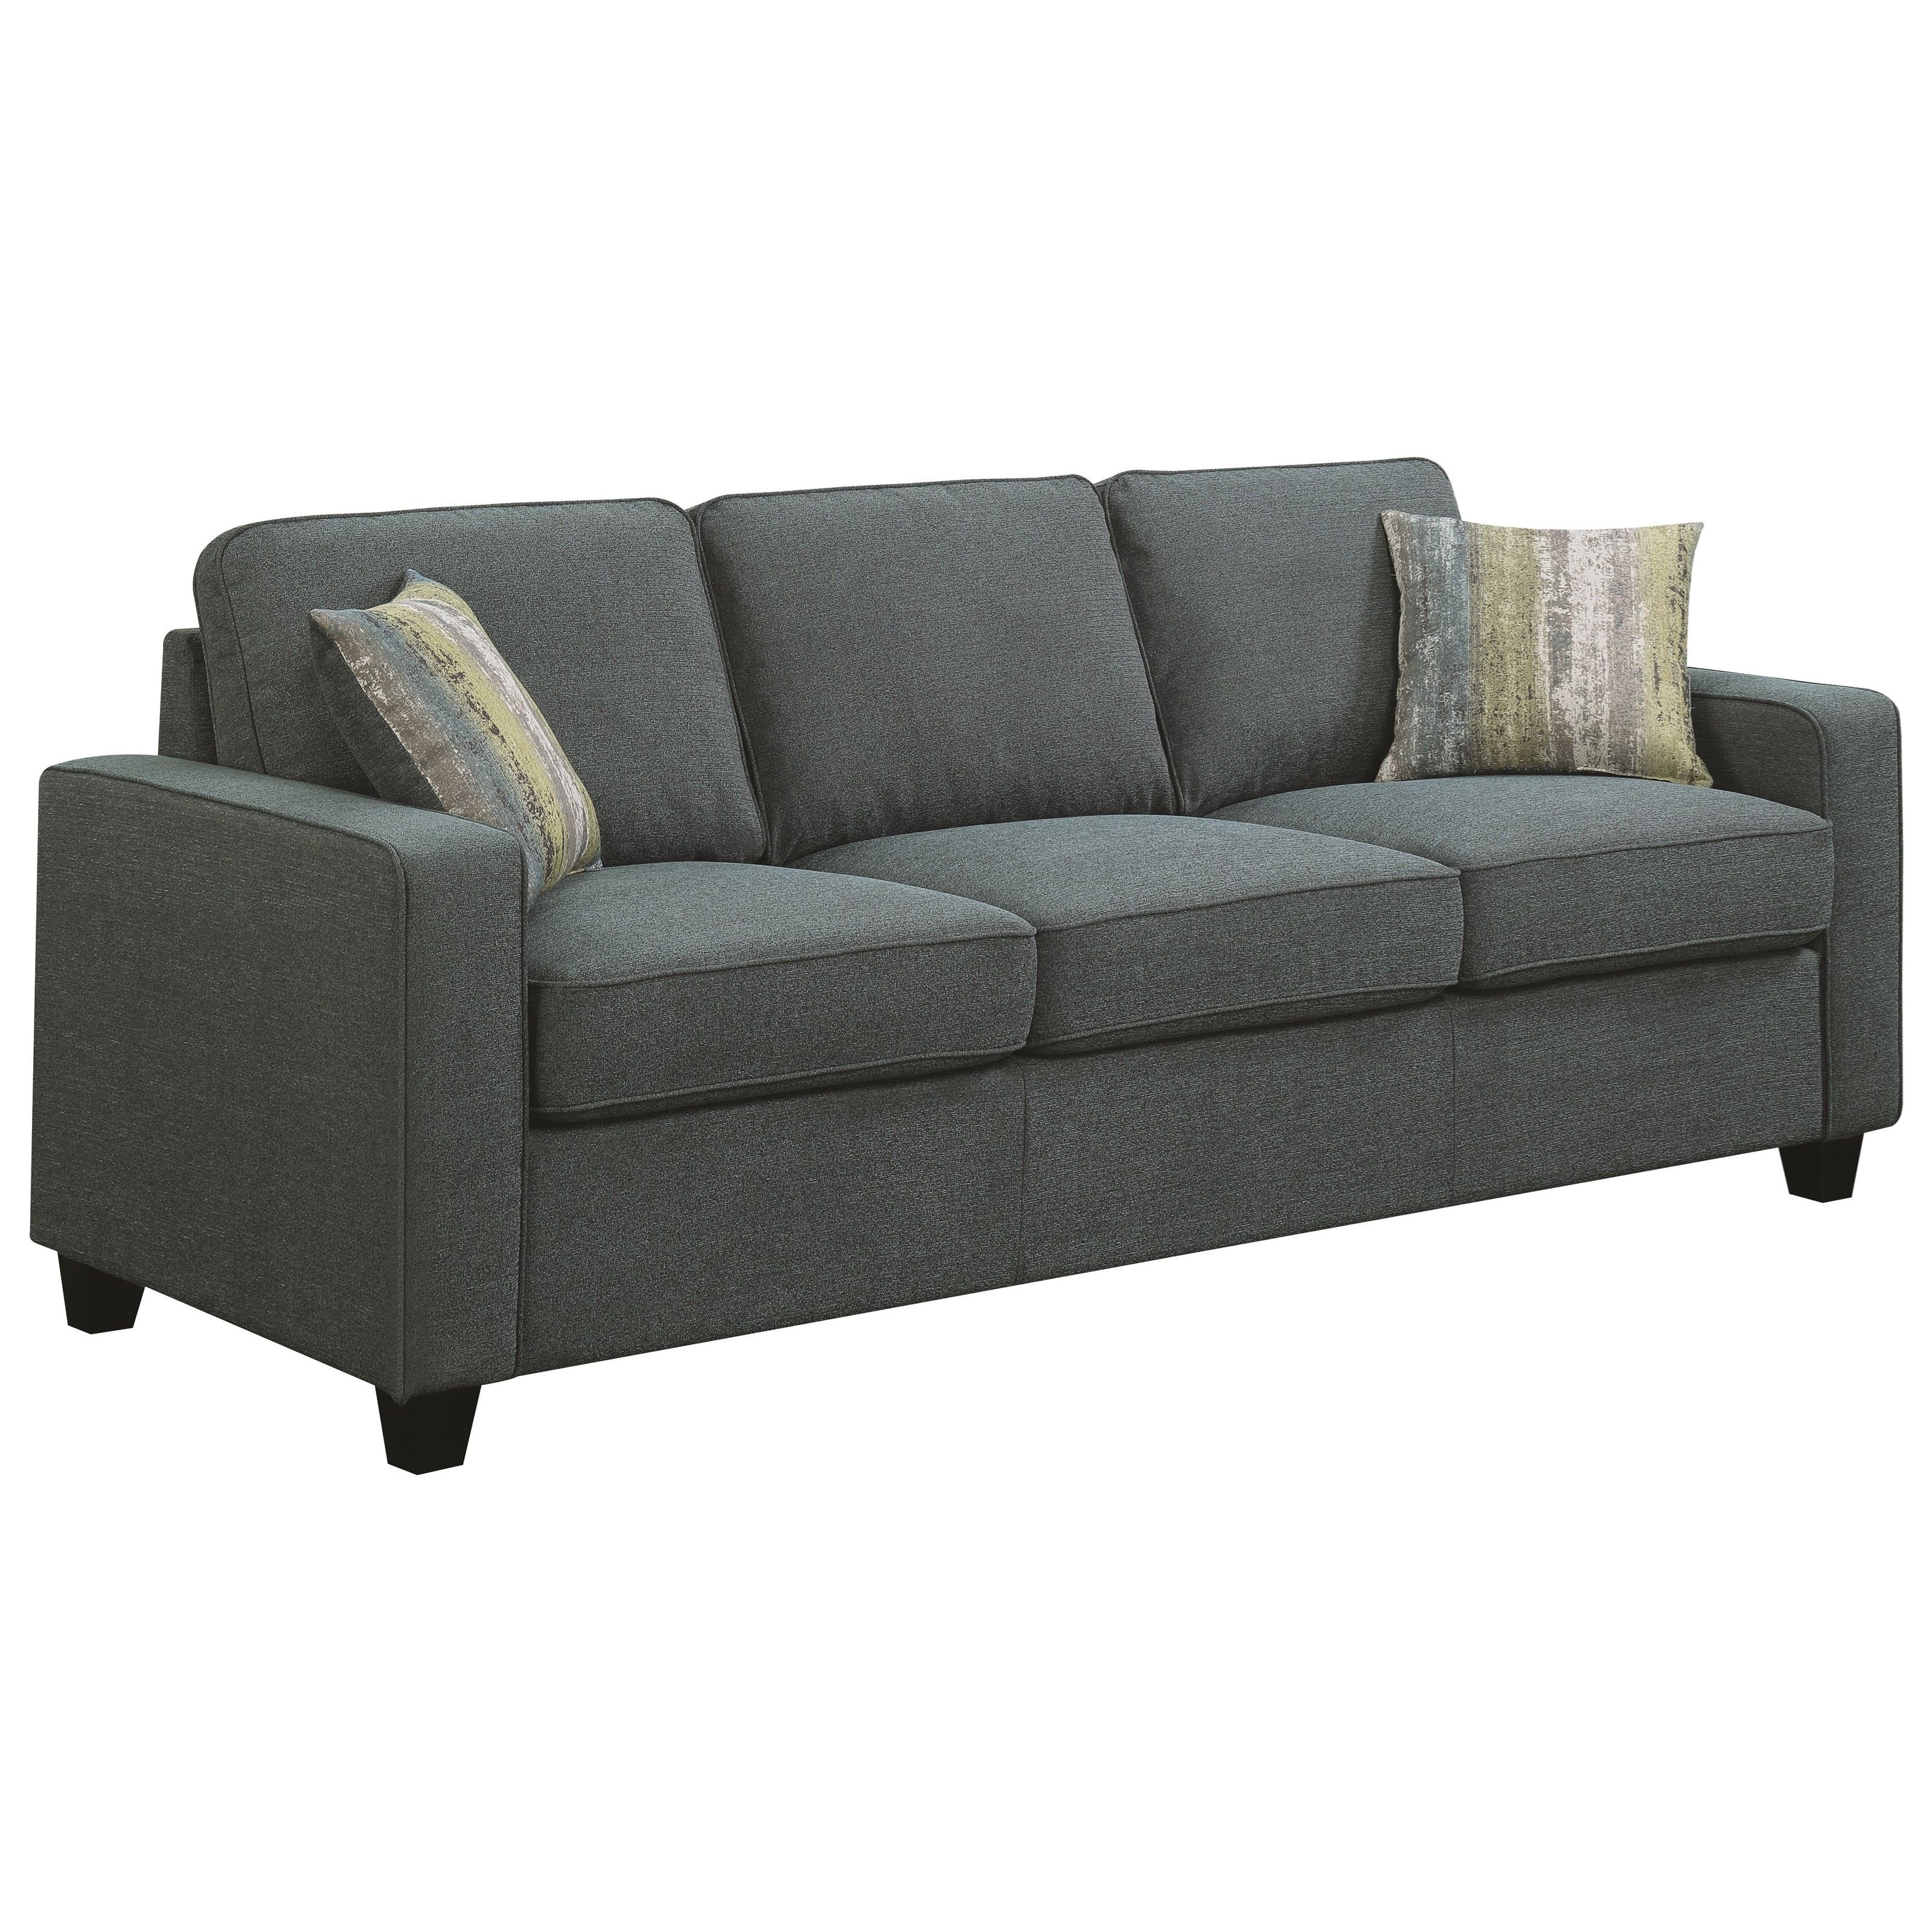 Scott Living Brownswood Sofa - Item Number: 506521